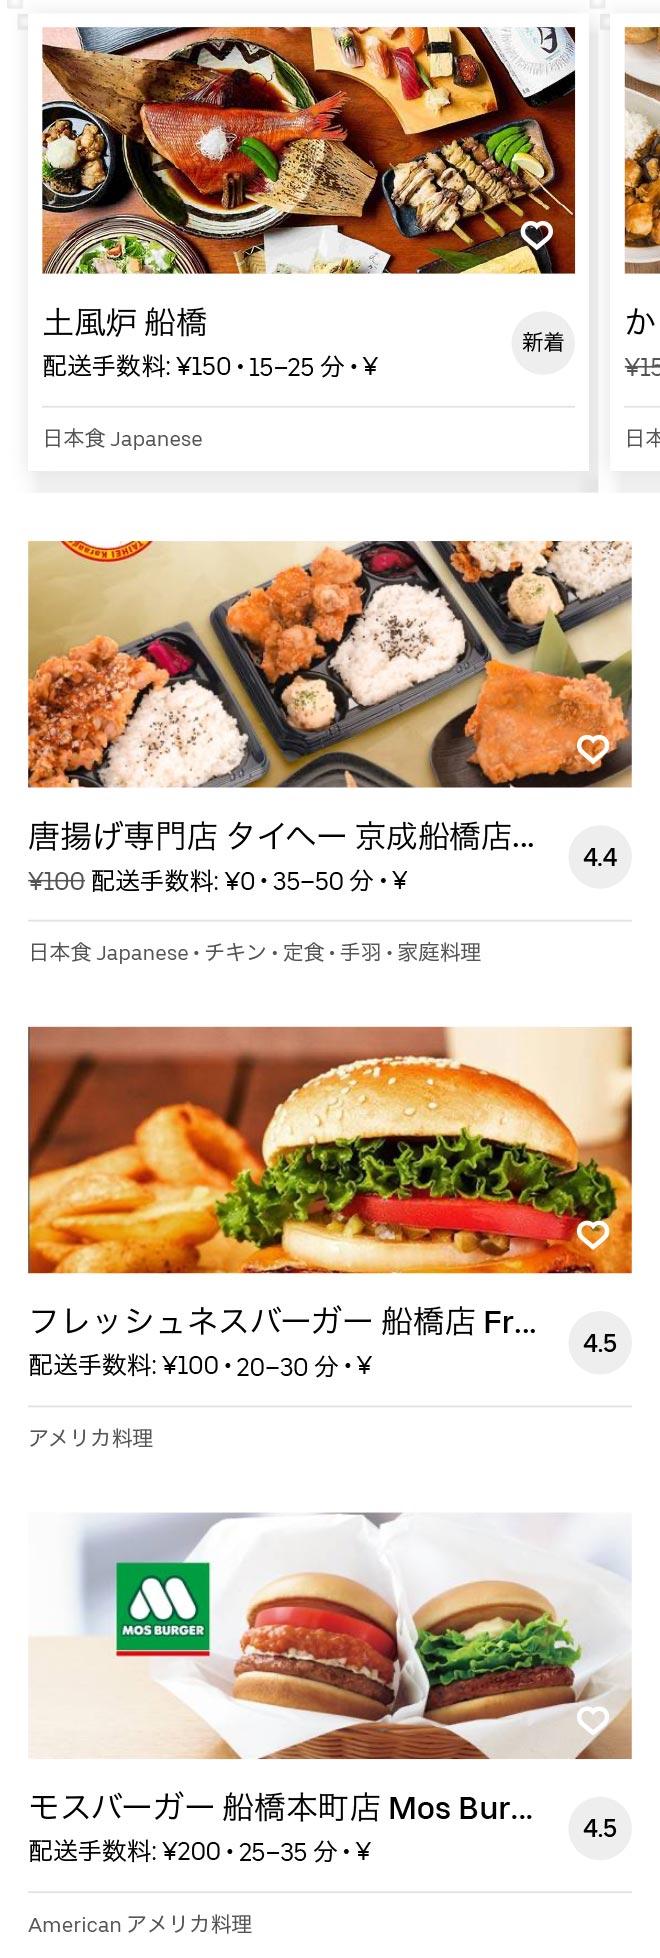 Funabashi menu 2008 02